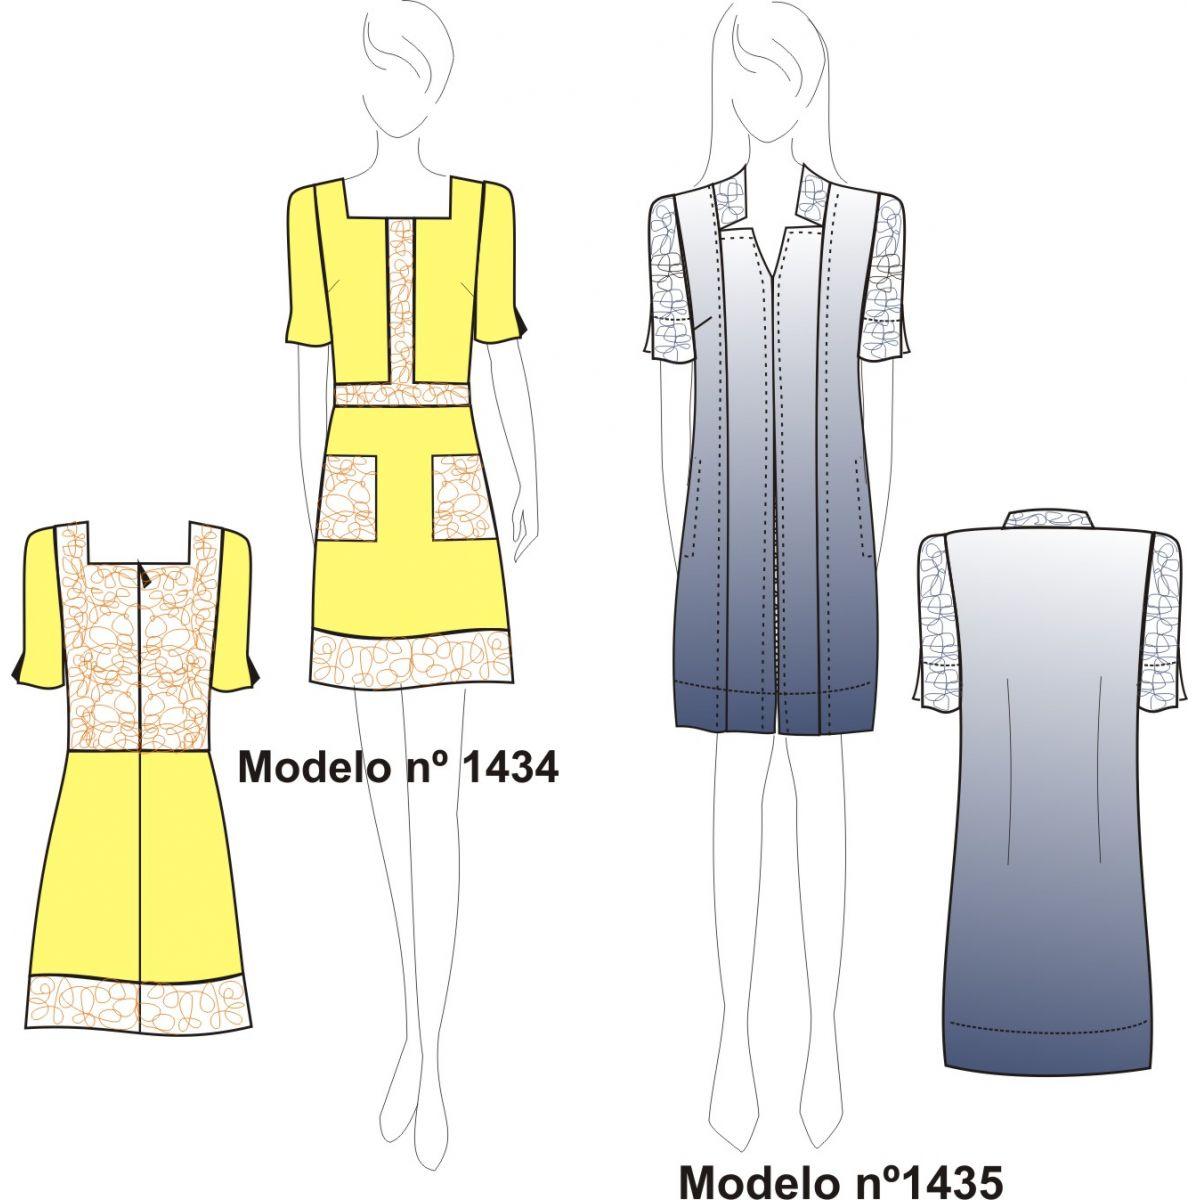 Informe da Moda 232  - Corte Centesimal